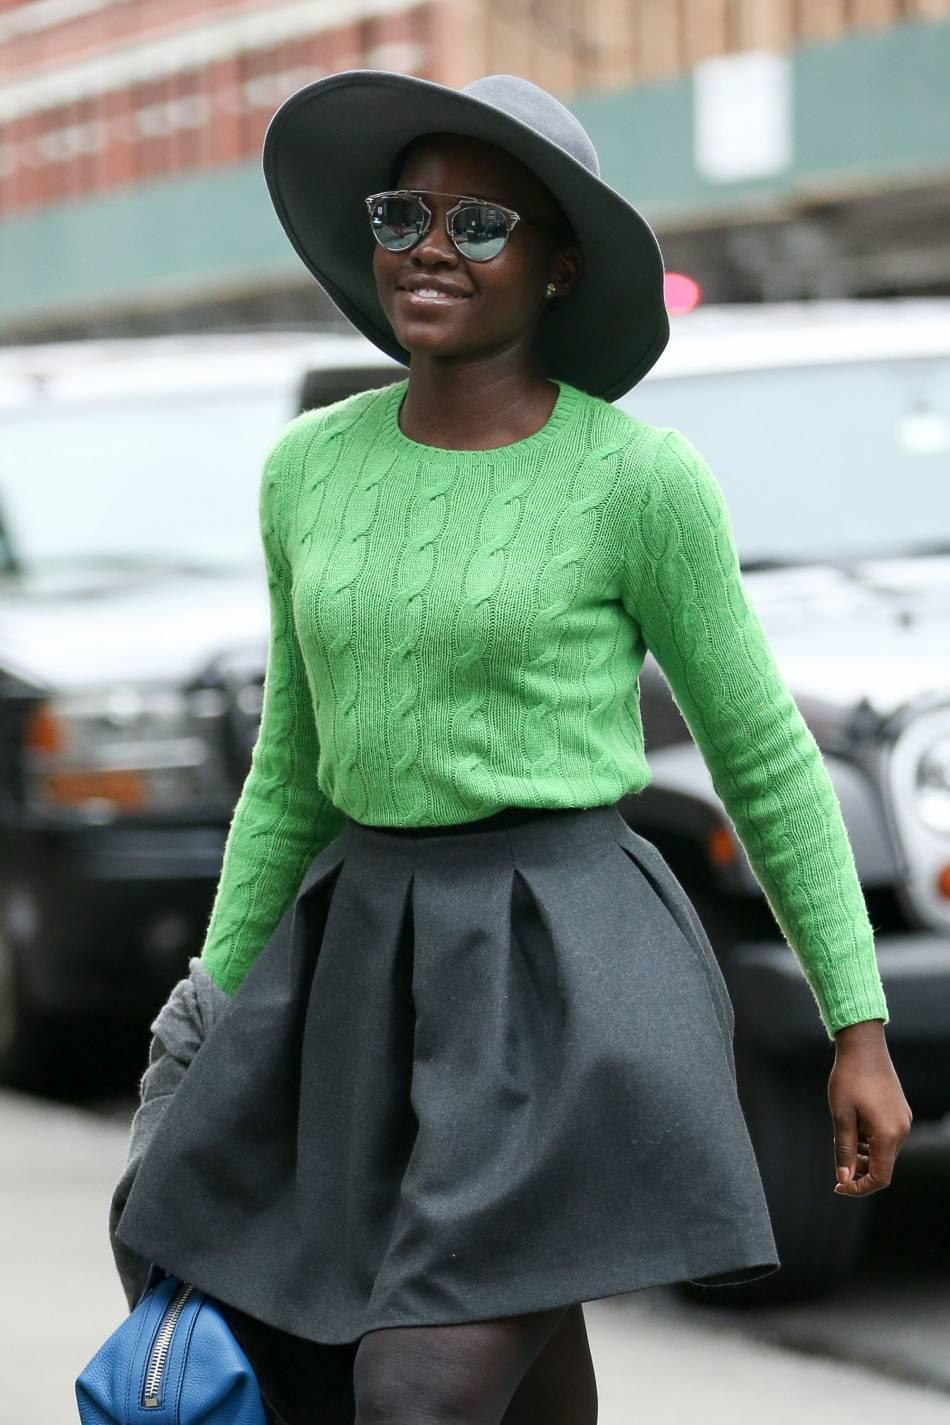 Lupita Nyong'o allie le bleu et le vert, on ose ou pas ?